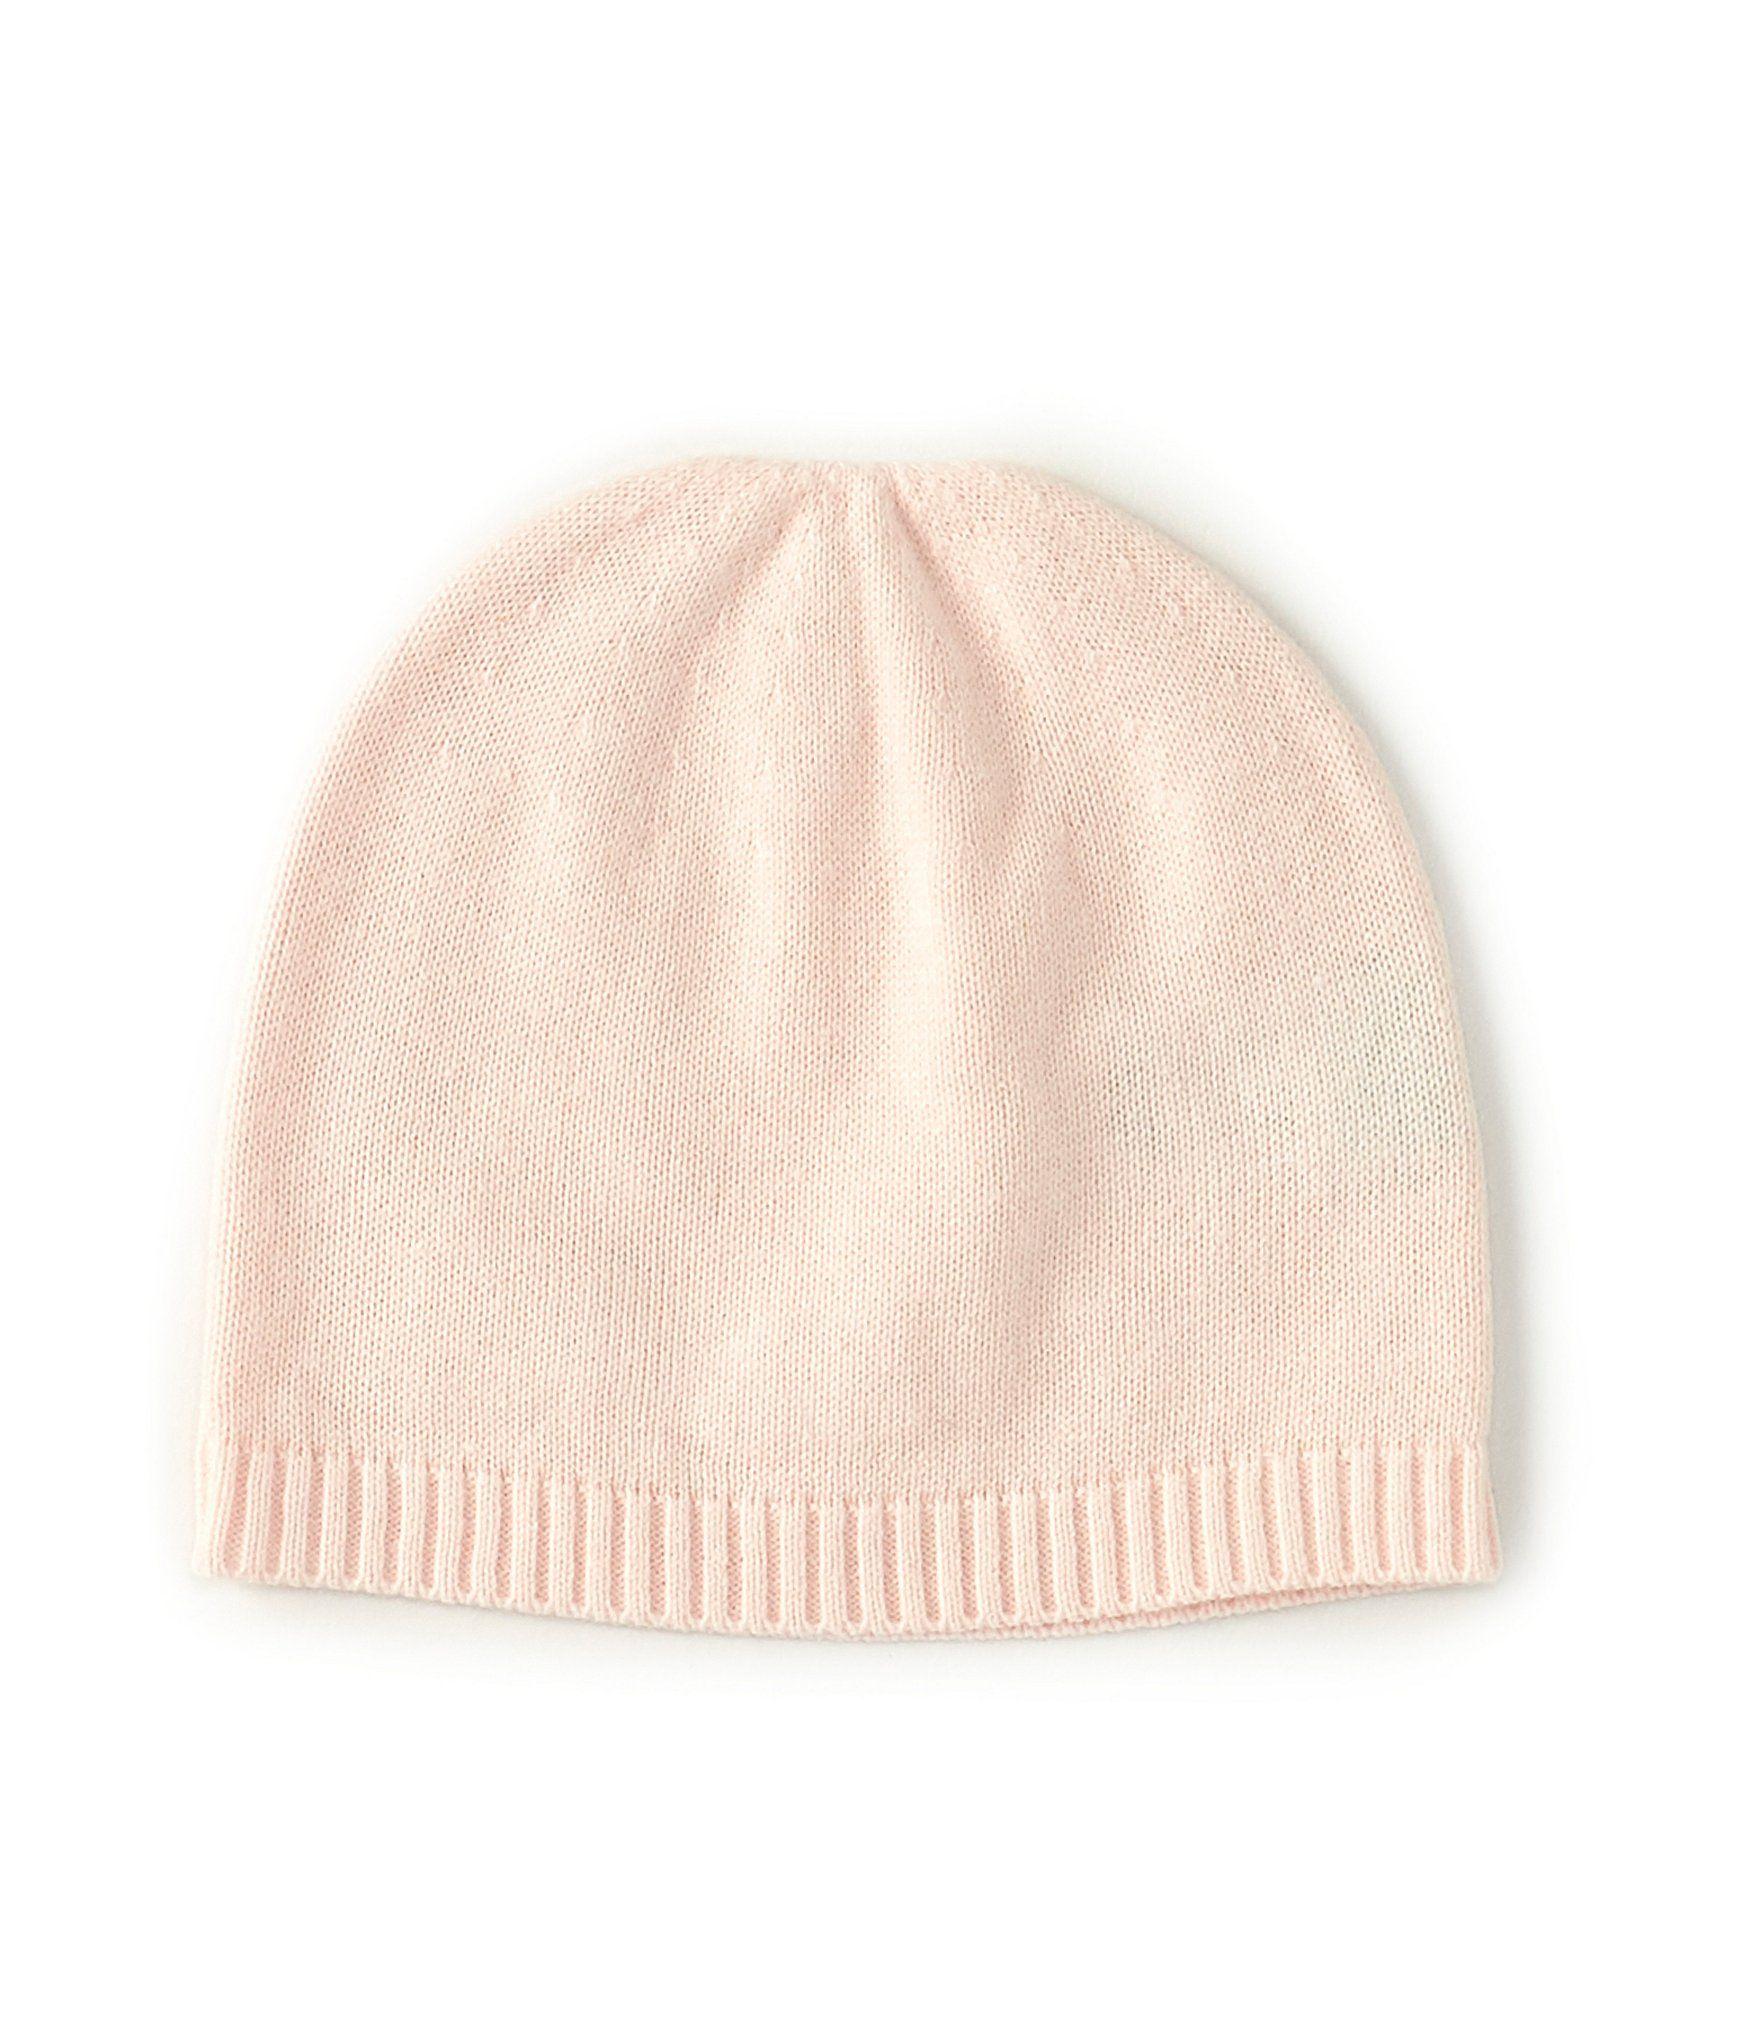 Photo of Edgehill Collection Baby Girls Newborn-6 Months Sweater-Knit Hat | Dillard's